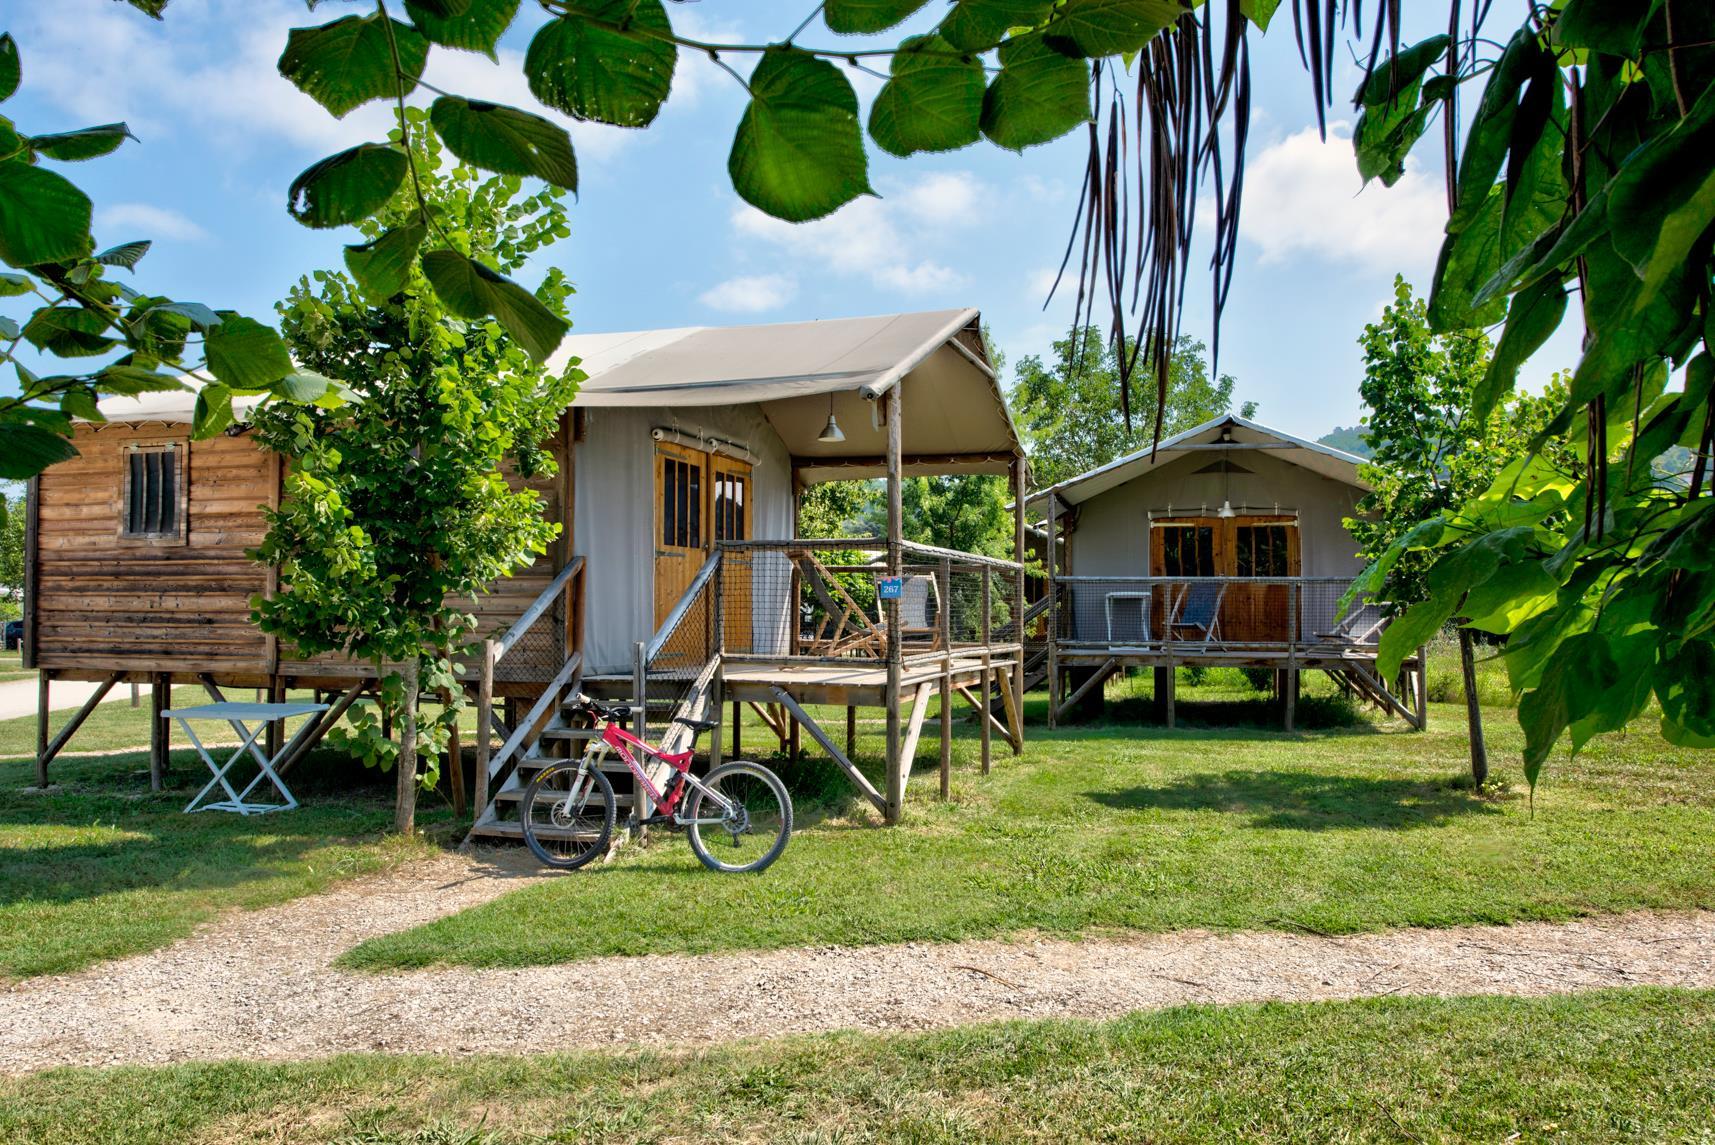 Camping Municipal les Ondines, Souillac, Lot